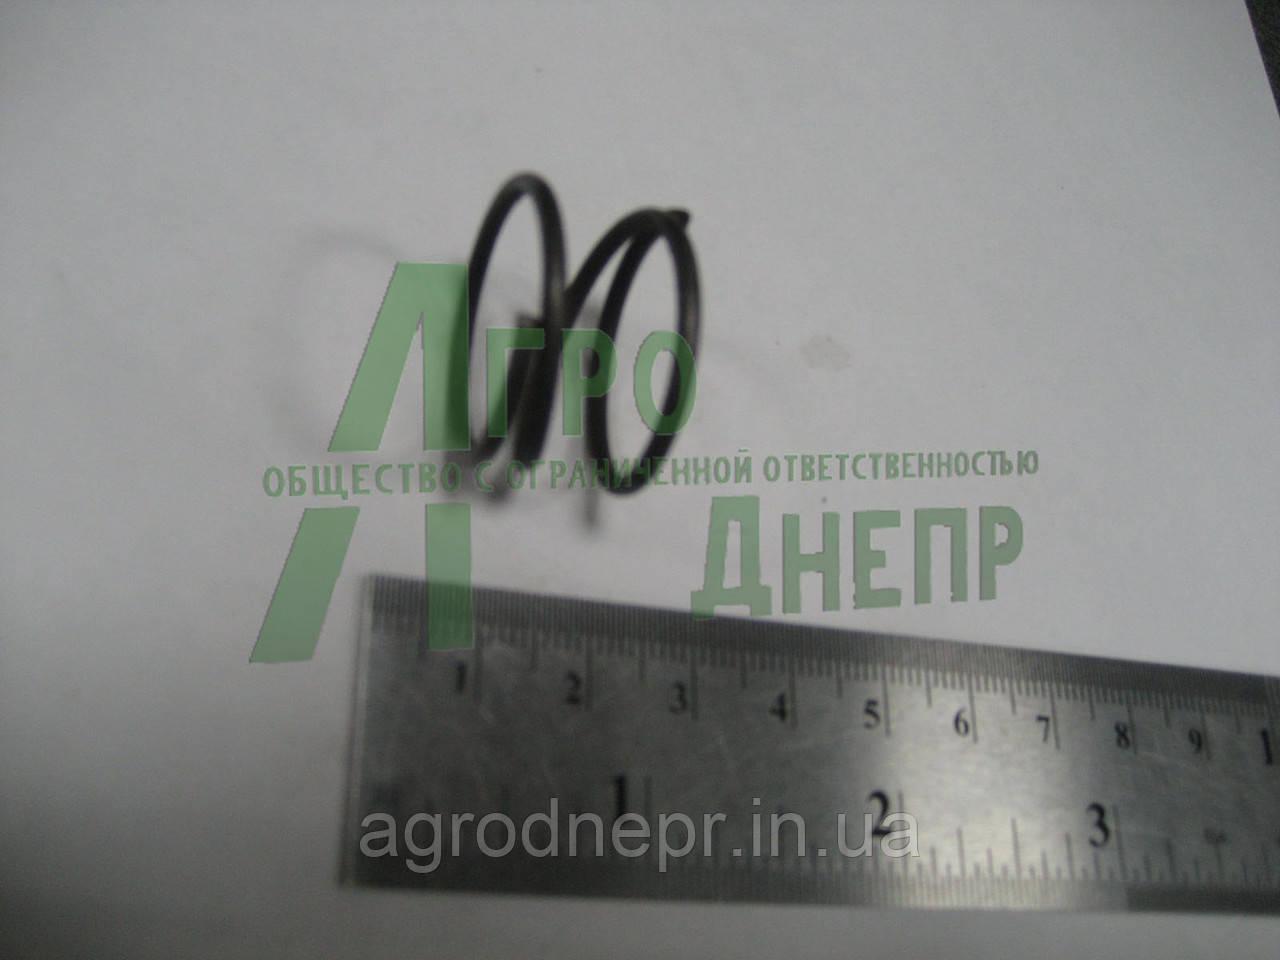 Пружина механизма коромысел Д-65 Д02-017 ЮМЗ